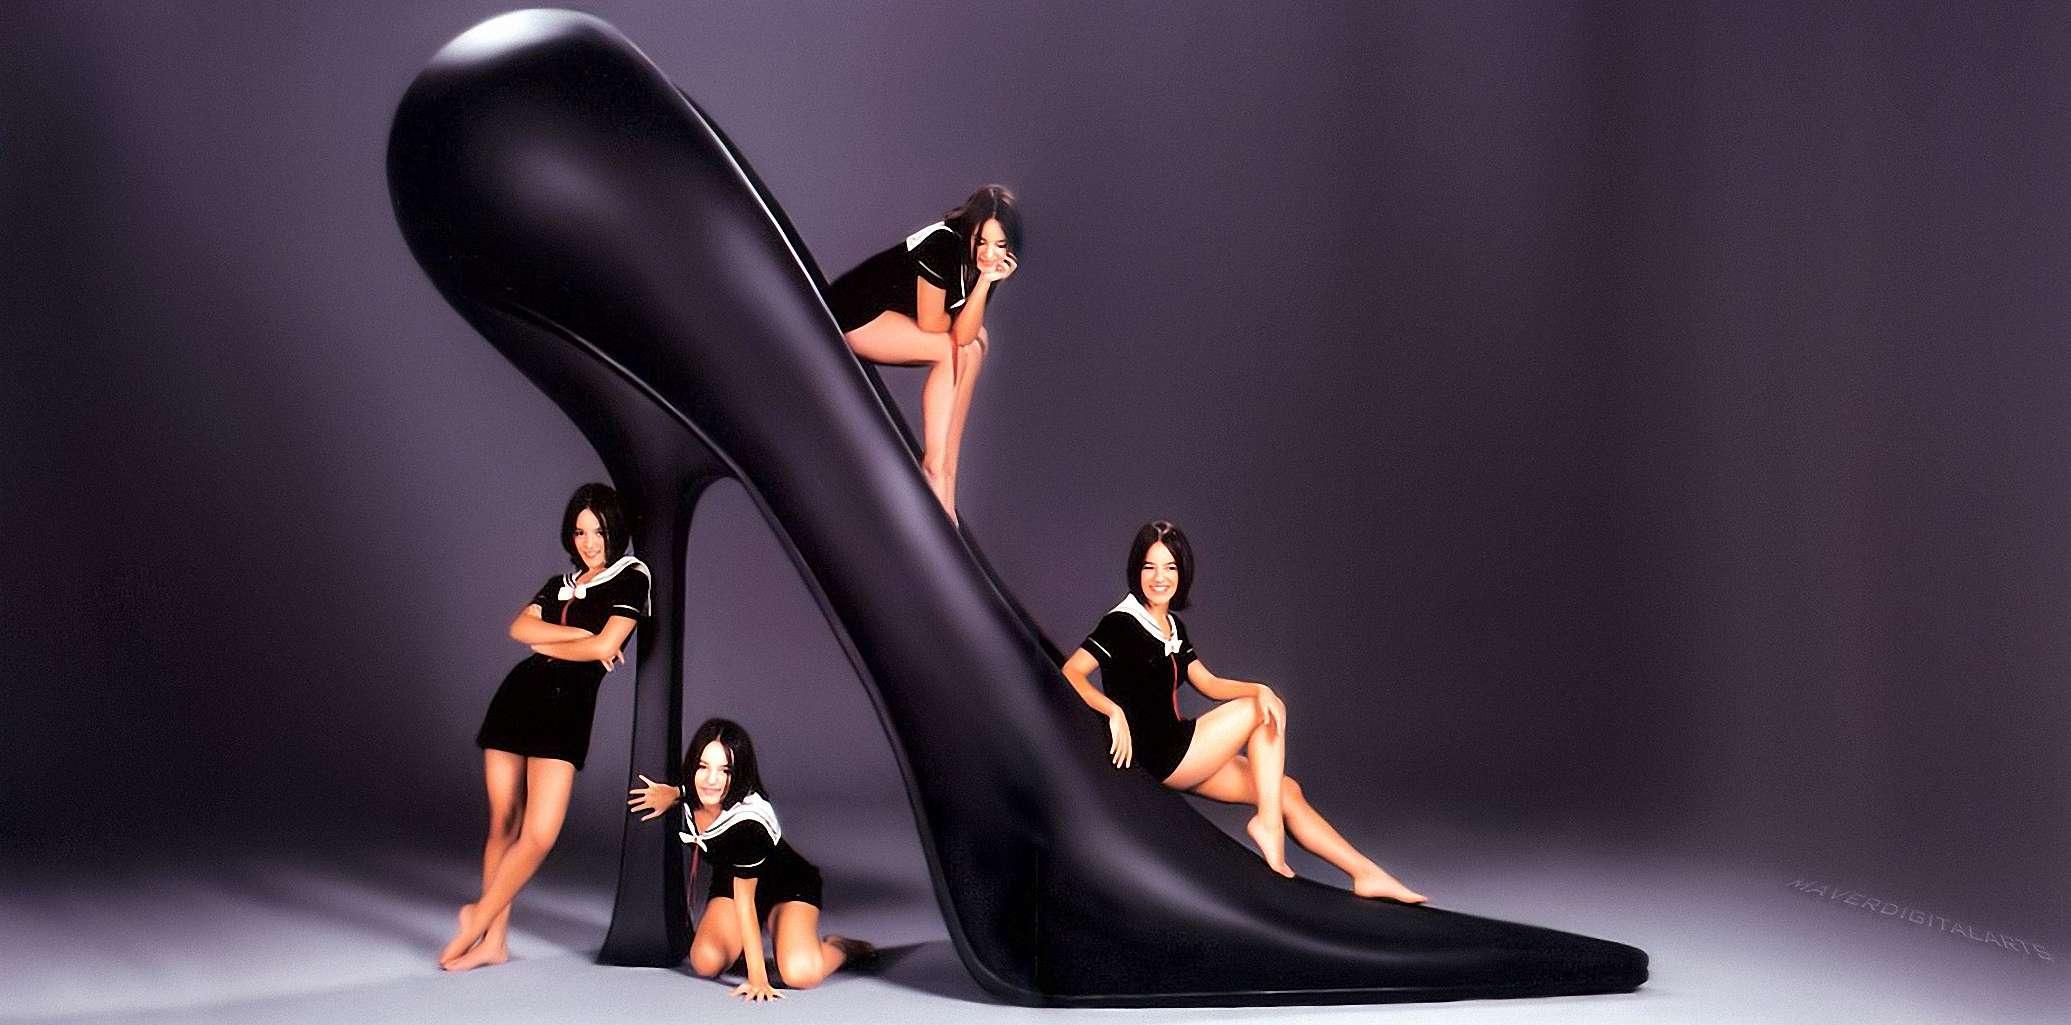 Alizee high heels hentai scene